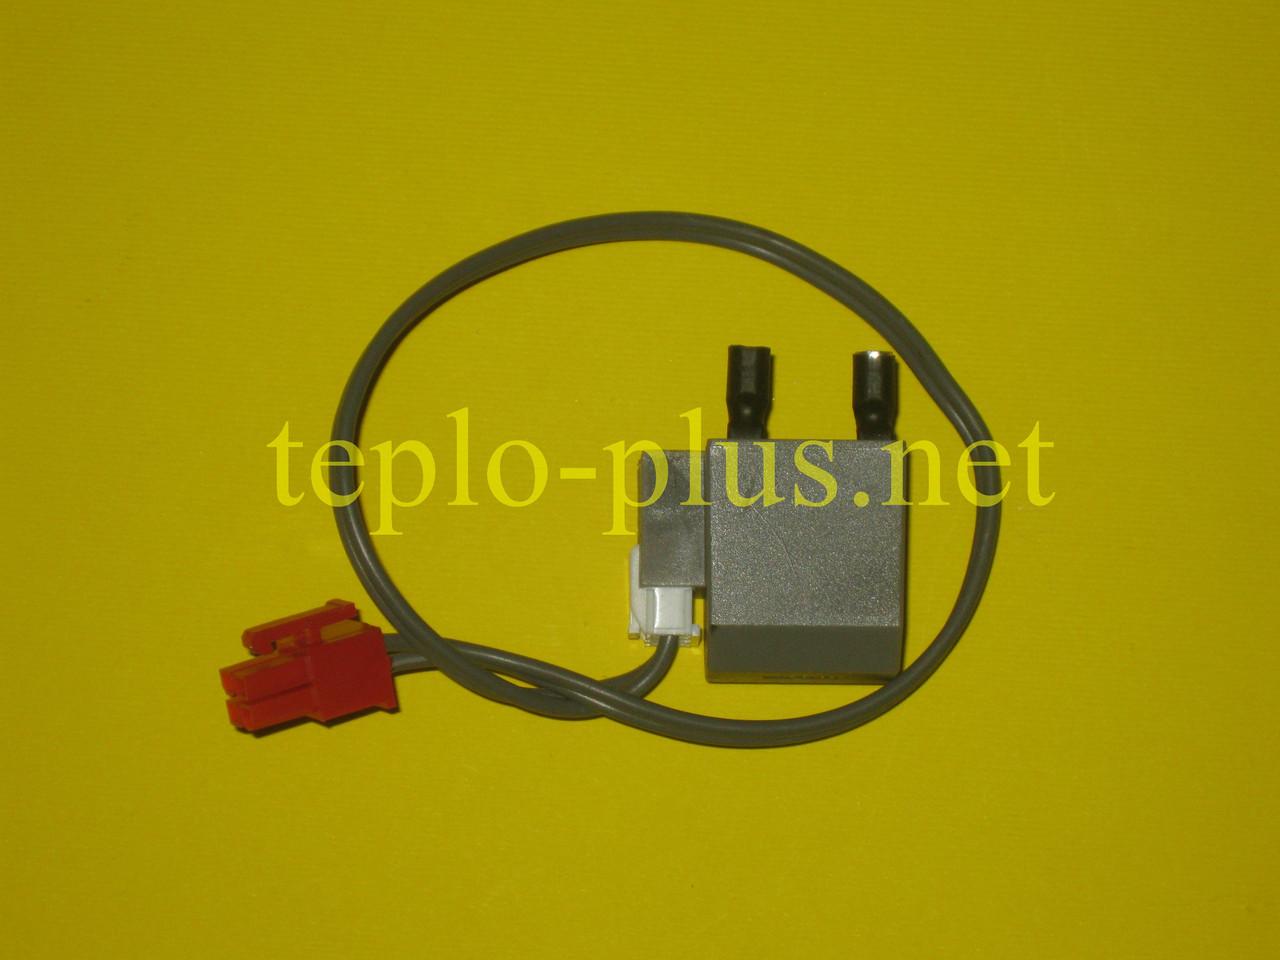 Трансформатор розжига BH1201043C (BH1201022A) Navien Ace ATMO 13-24kw, TURBO 10-40kw, TURBO Coaxial 10-30kw, фото 2